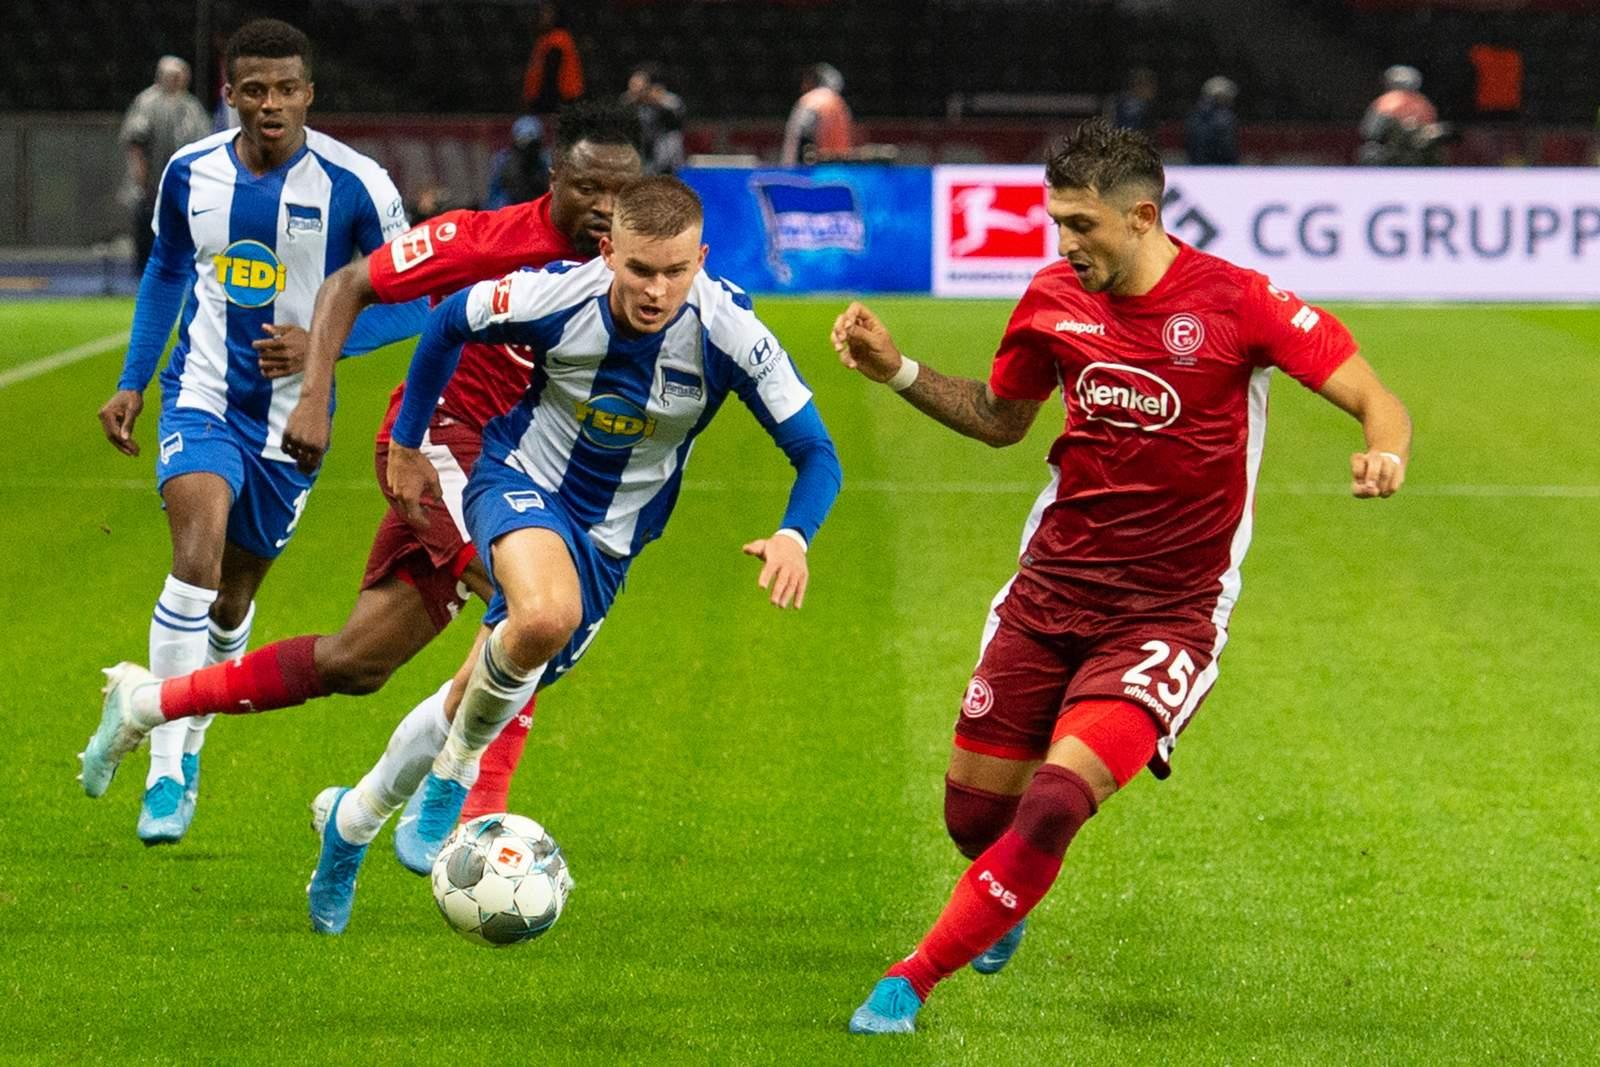 Dusseldorf vs Hertha Free Betting Tips